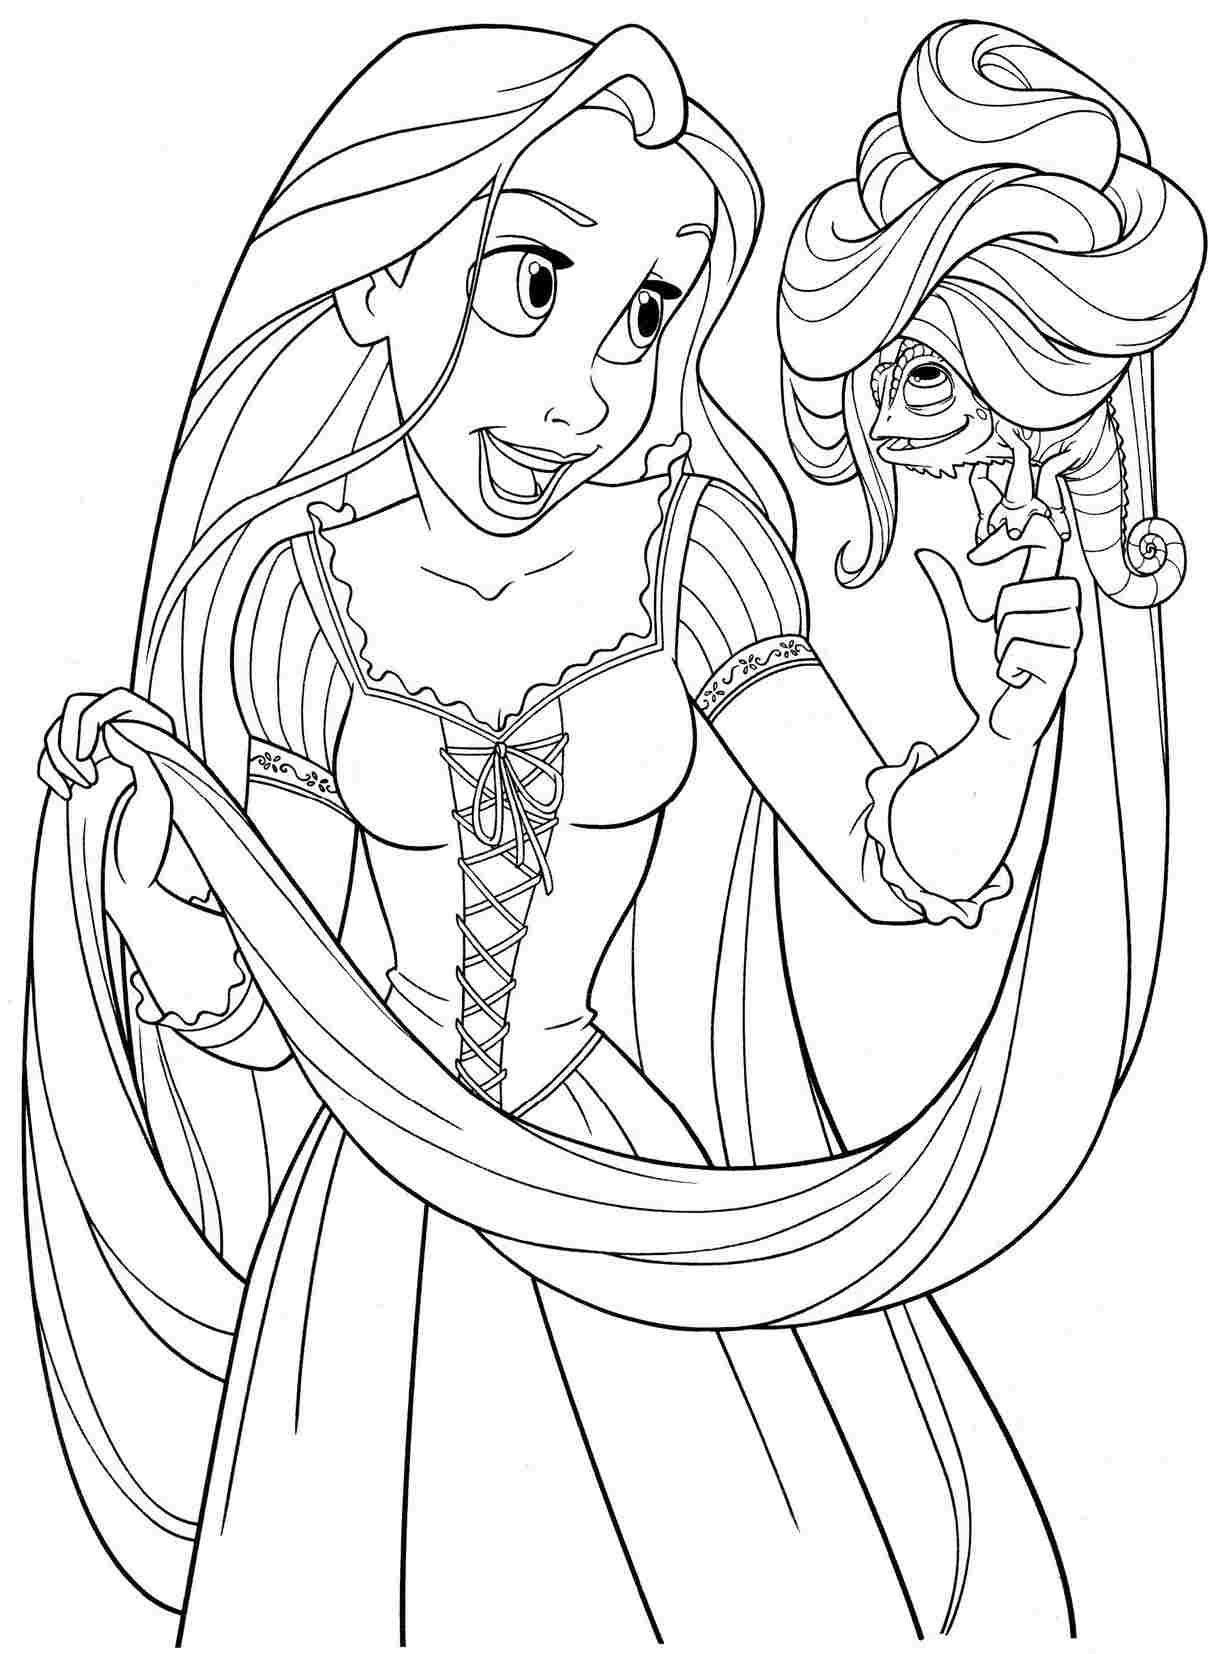 Free Coloring Page Princess Youngandtae Com Disney Princess Coloring Pages Rapunzel Coloring Pages Disney Princess Colors